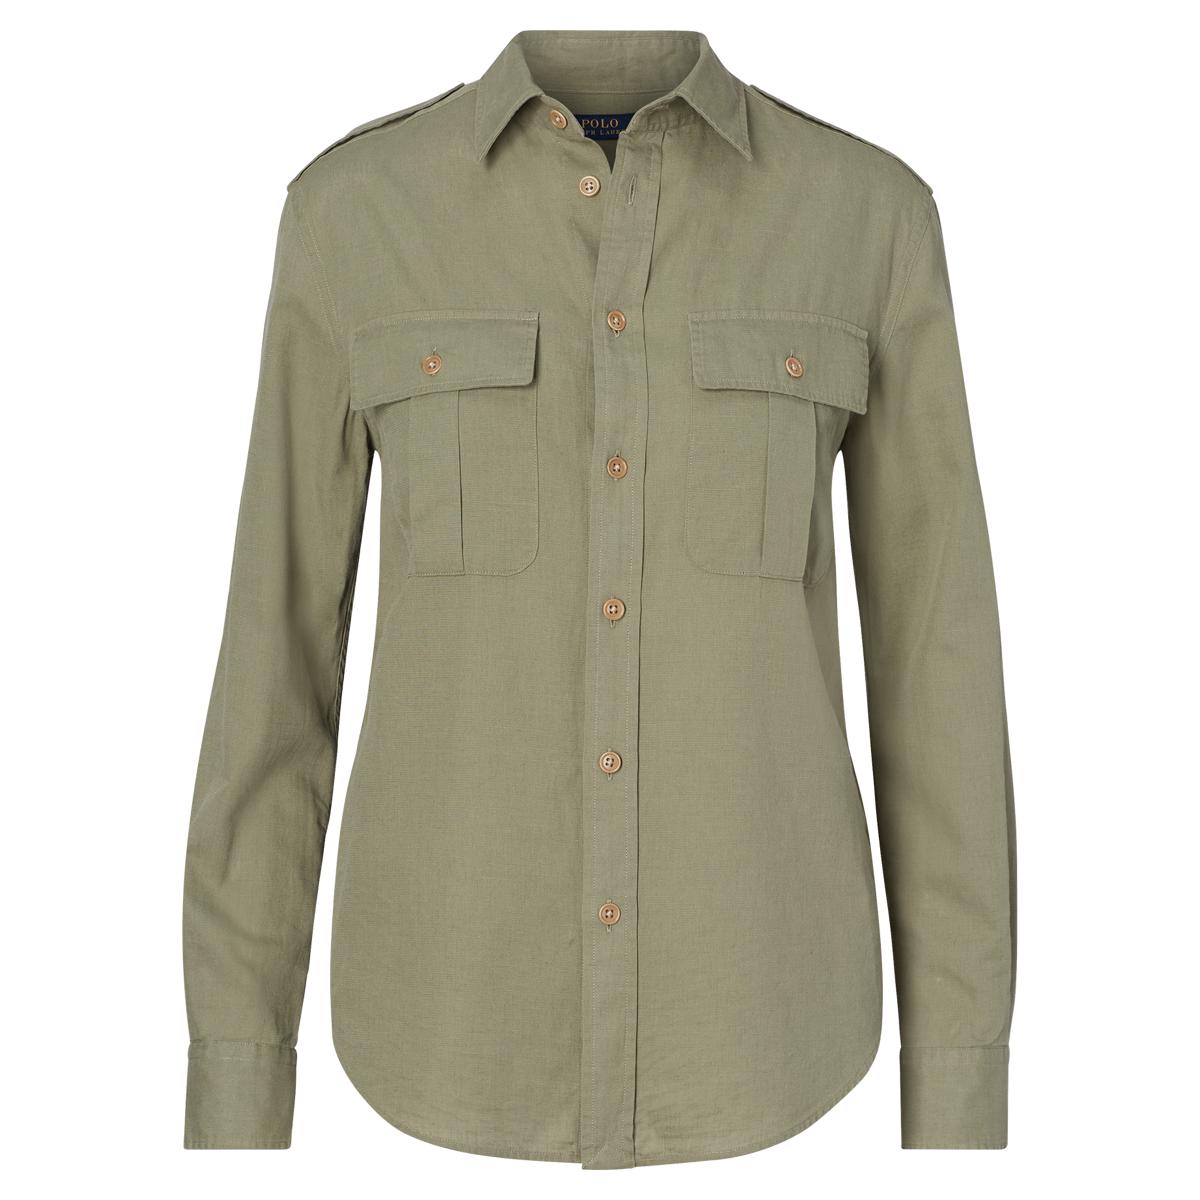 ee5afe1a4 Cotton-Linen Safari Shirt